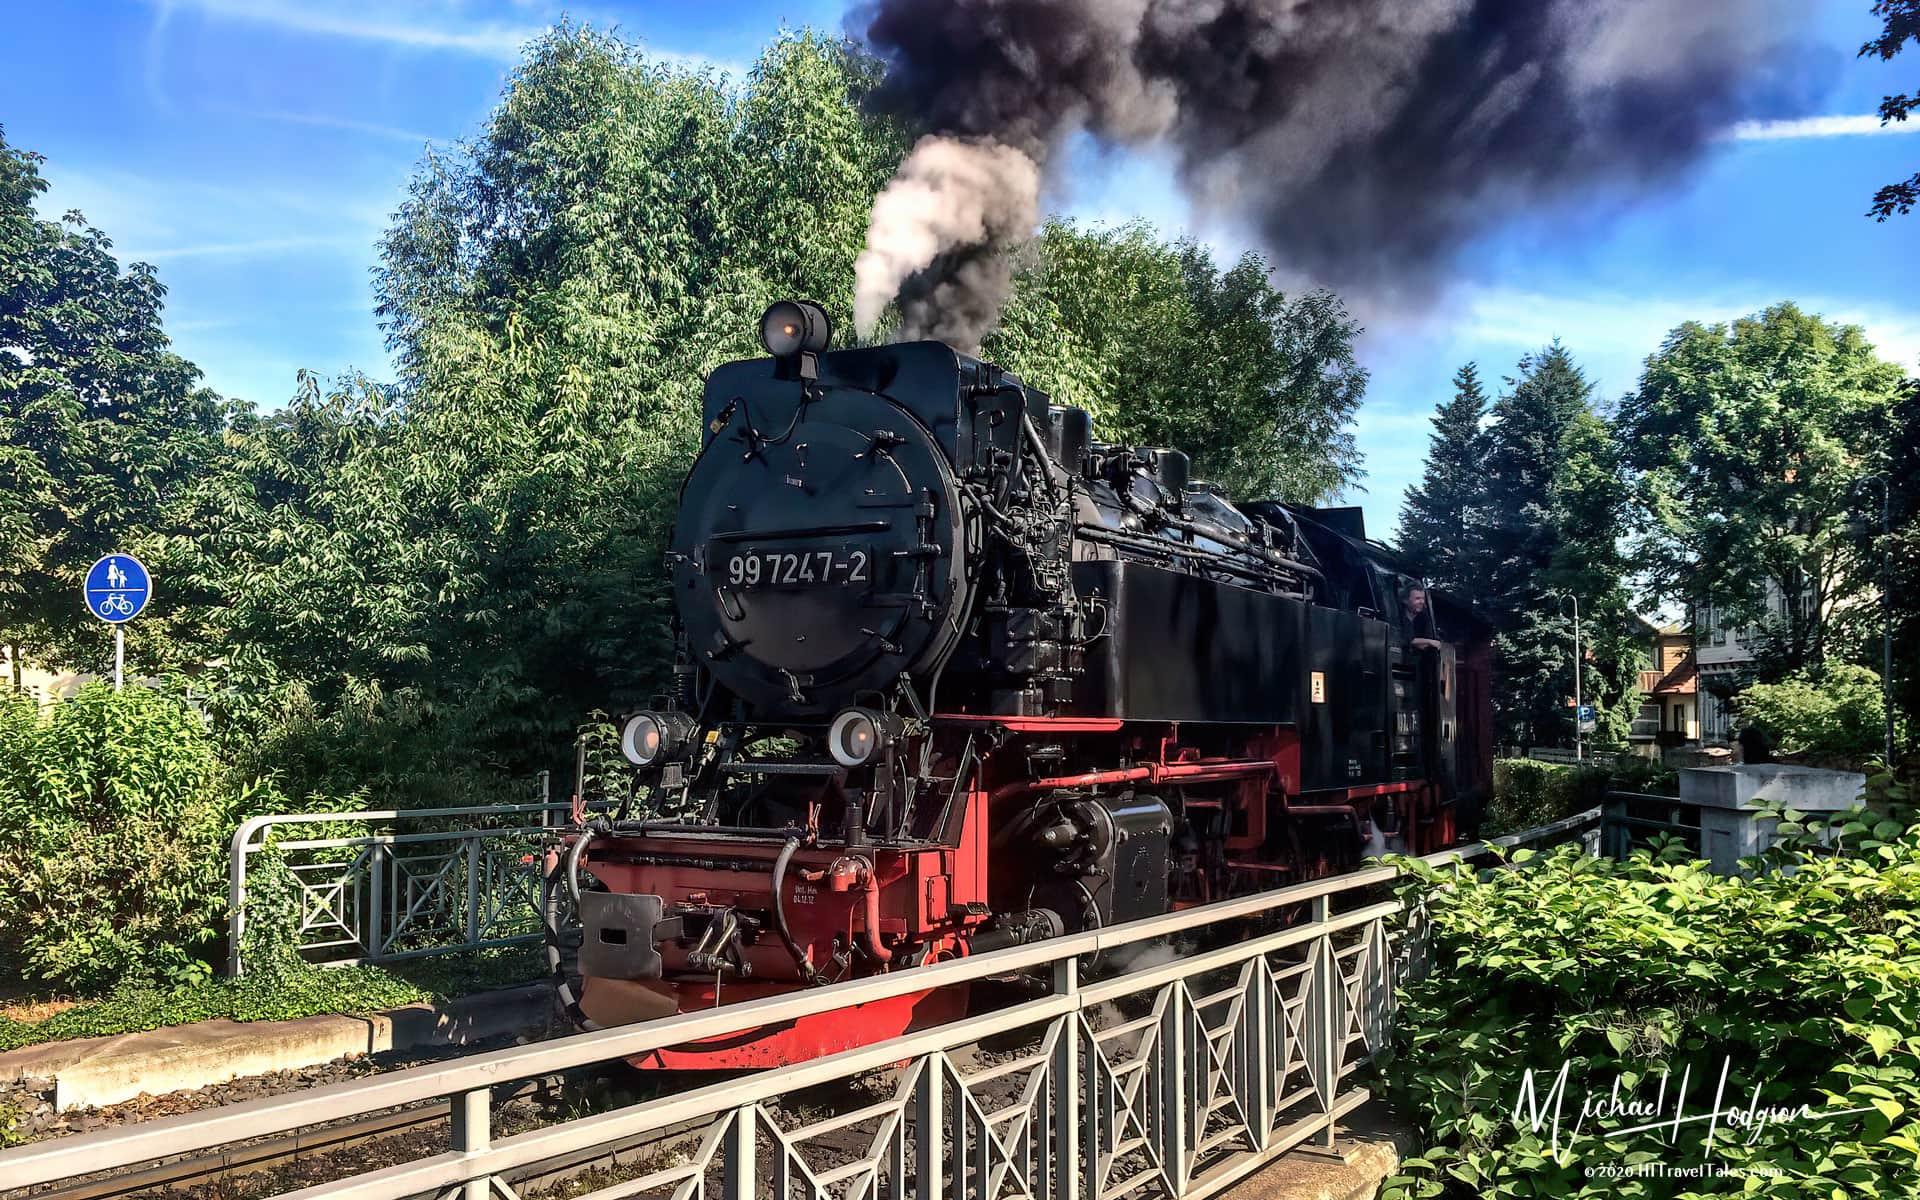 Steam Engine On The Brockenbahn Narrow Gauge Railway In The Harz